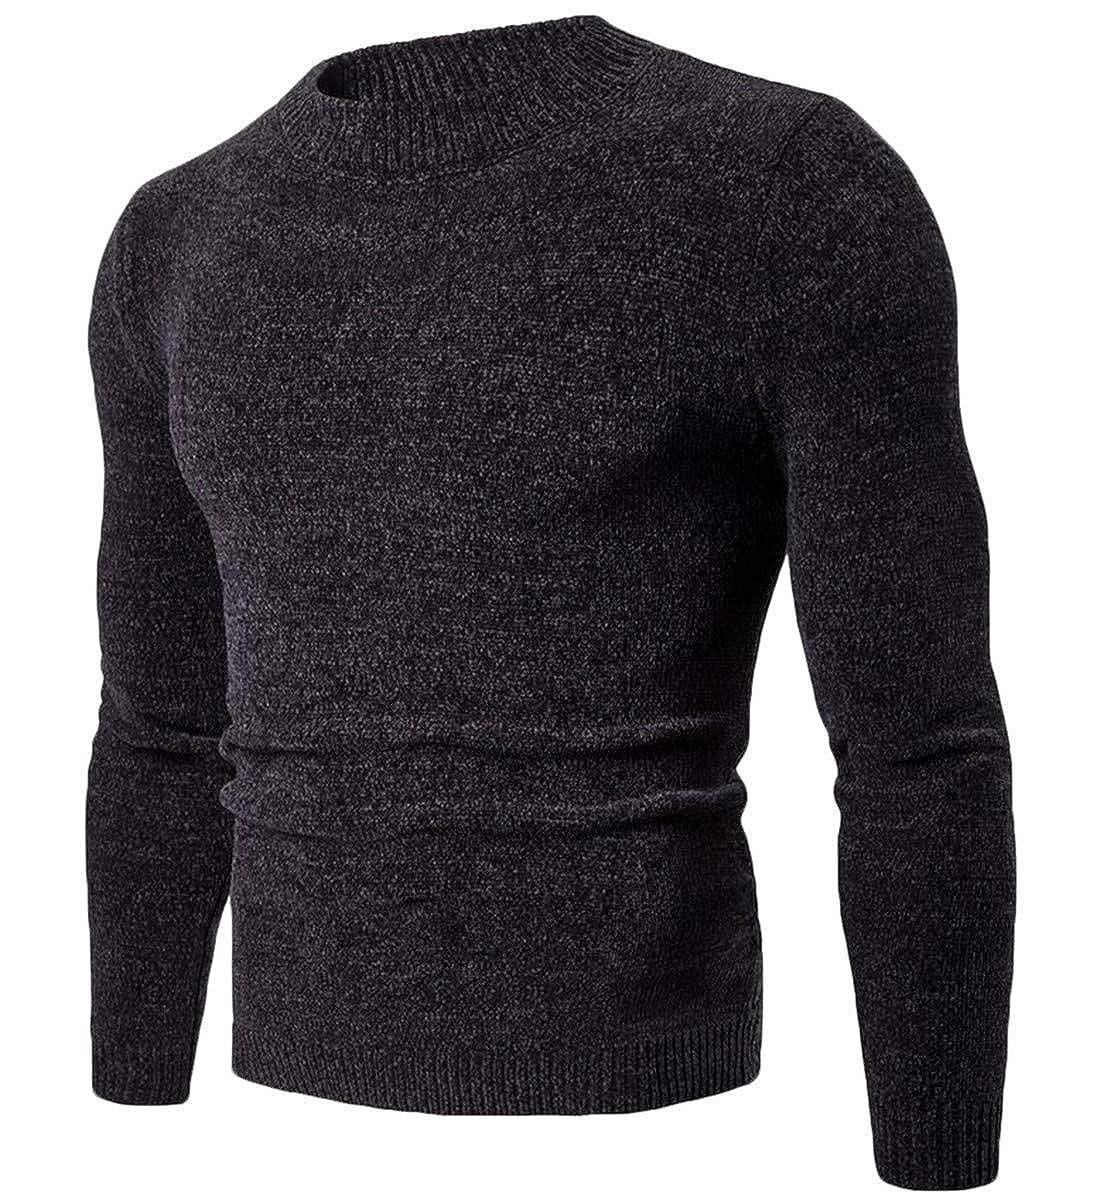 X-Future Mens Knit Slim Pullover Solid Color Fashion Crewneck Sweater